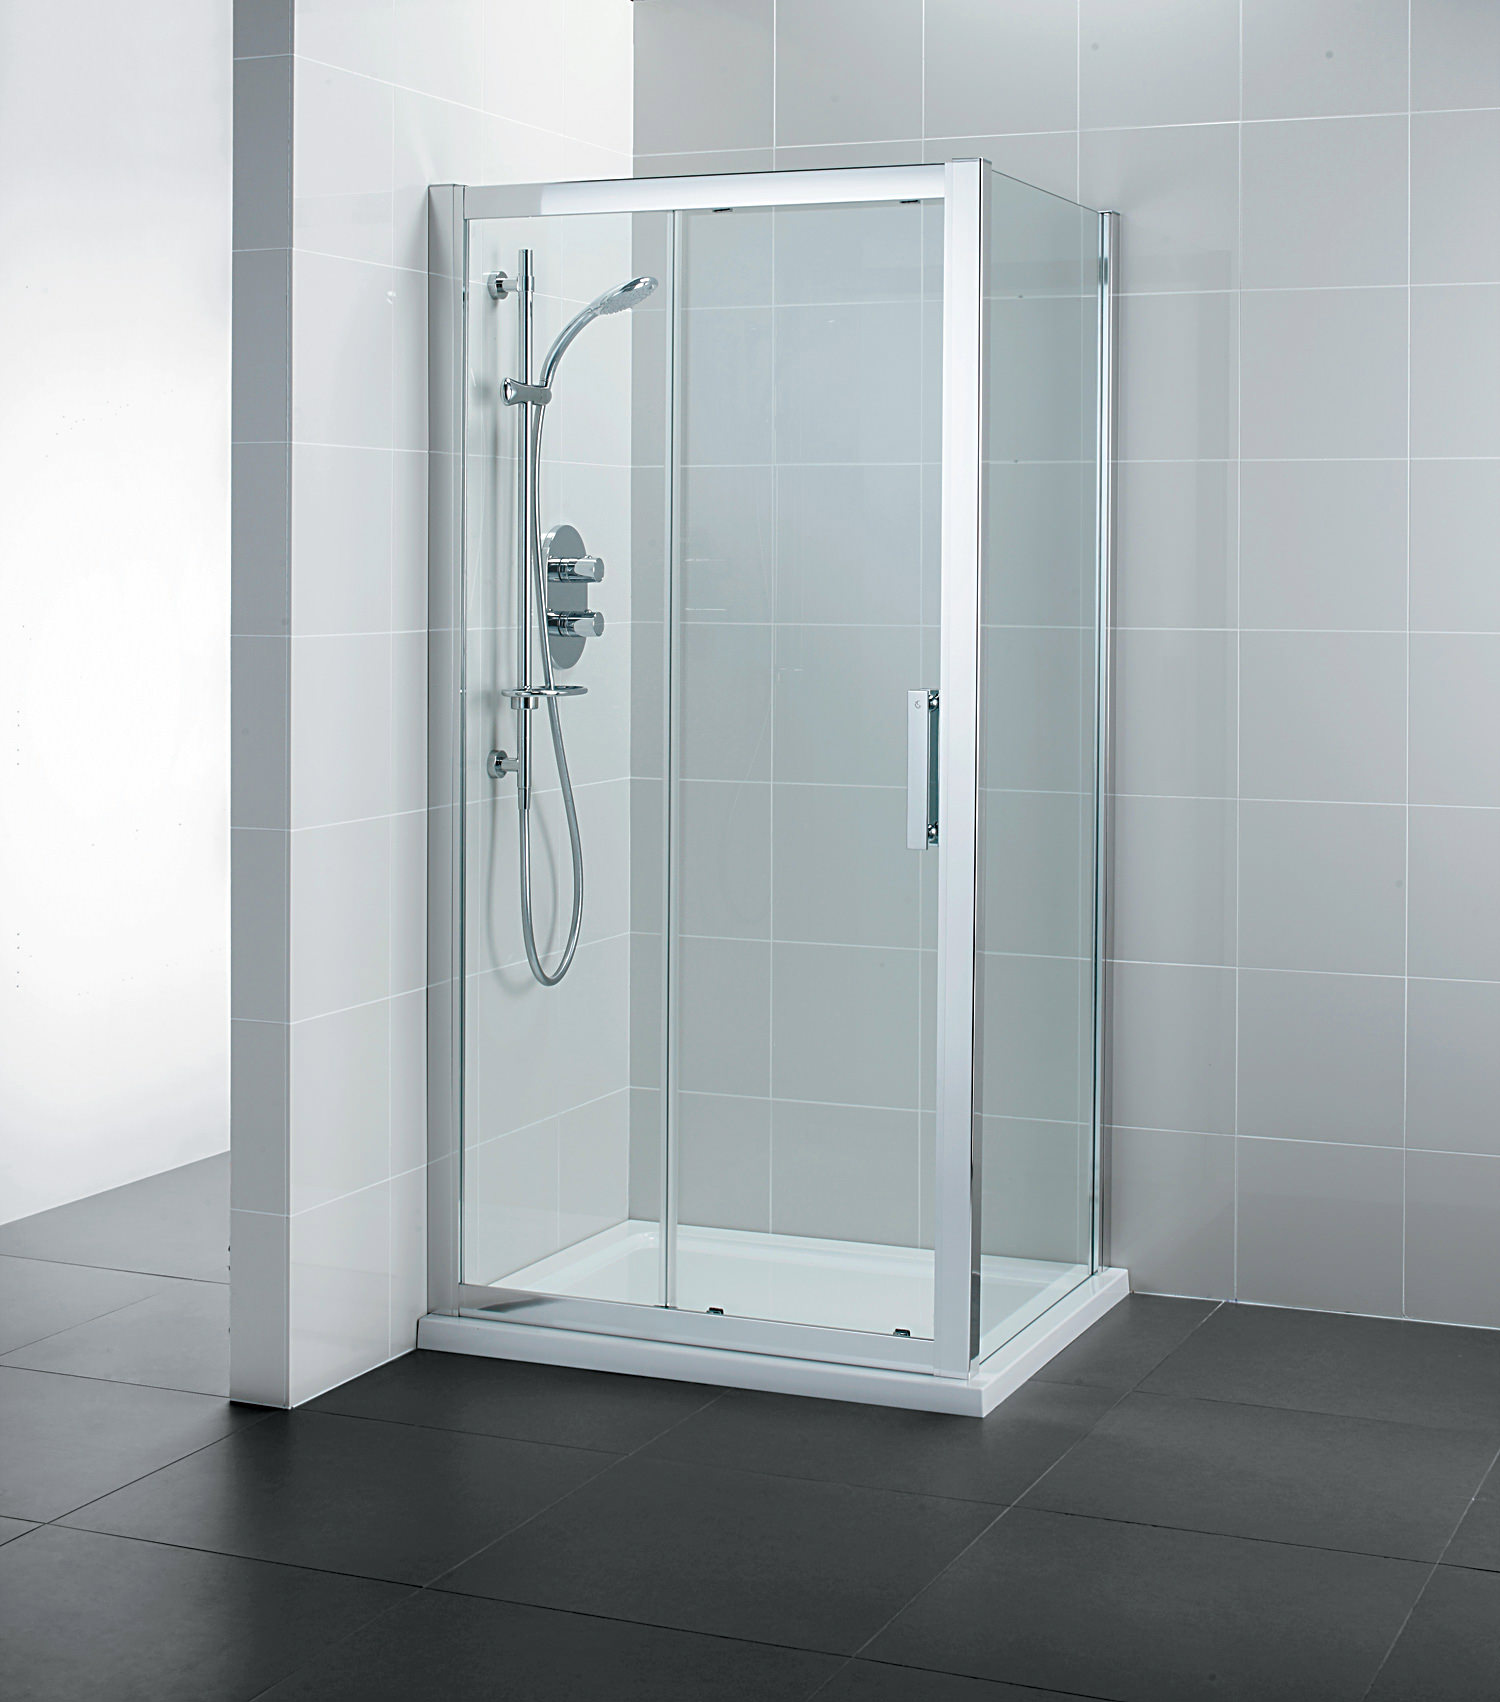 Ideal standard synergy slider shower door 1200mm l6289eo for 1200mm shower door